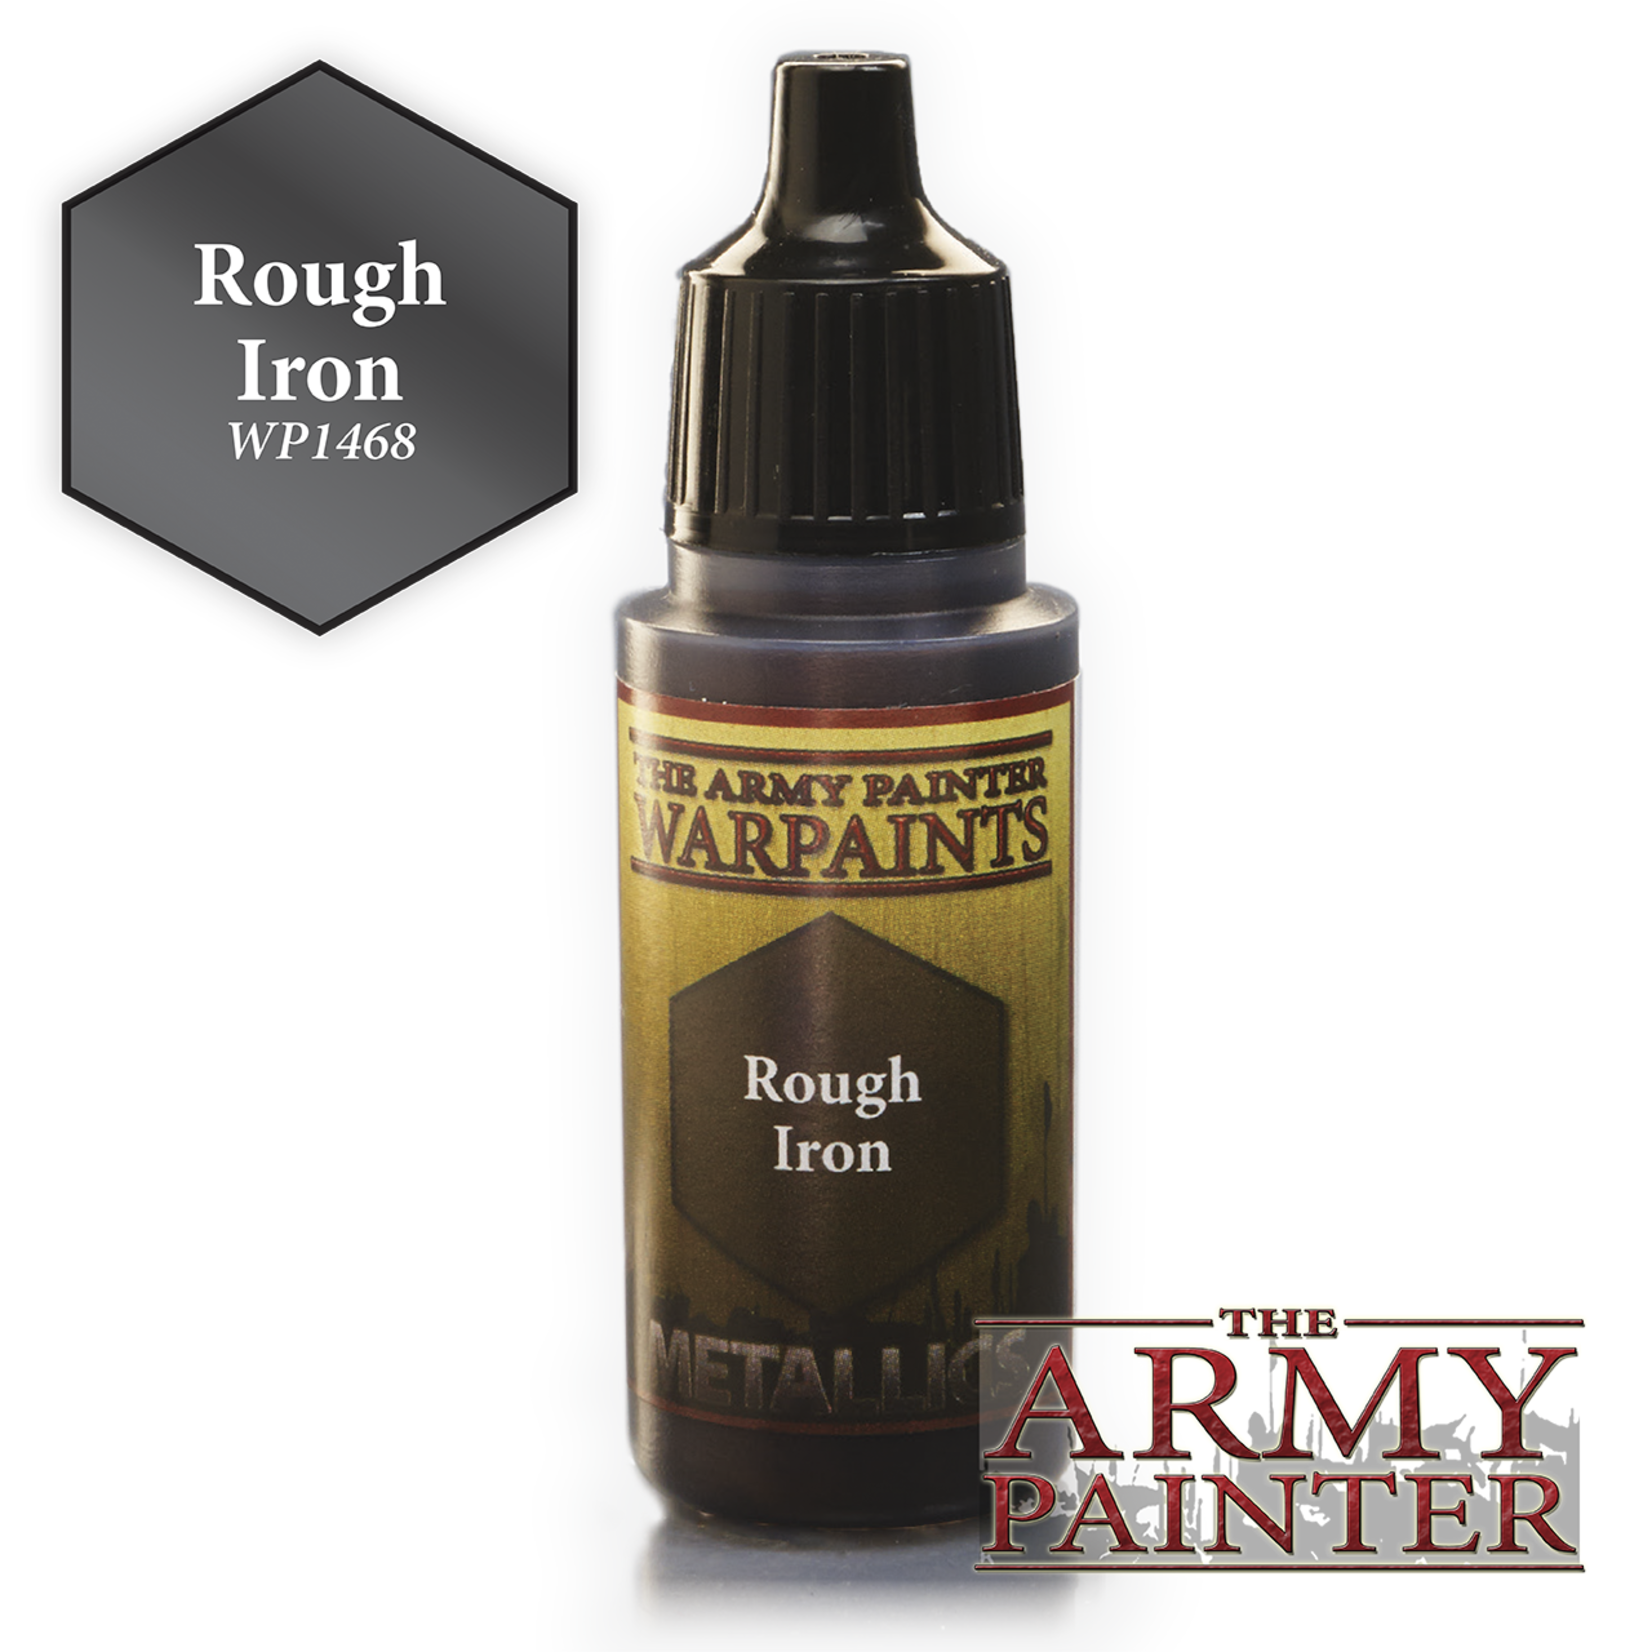 Army Painter APWP Rough Iron 18ml